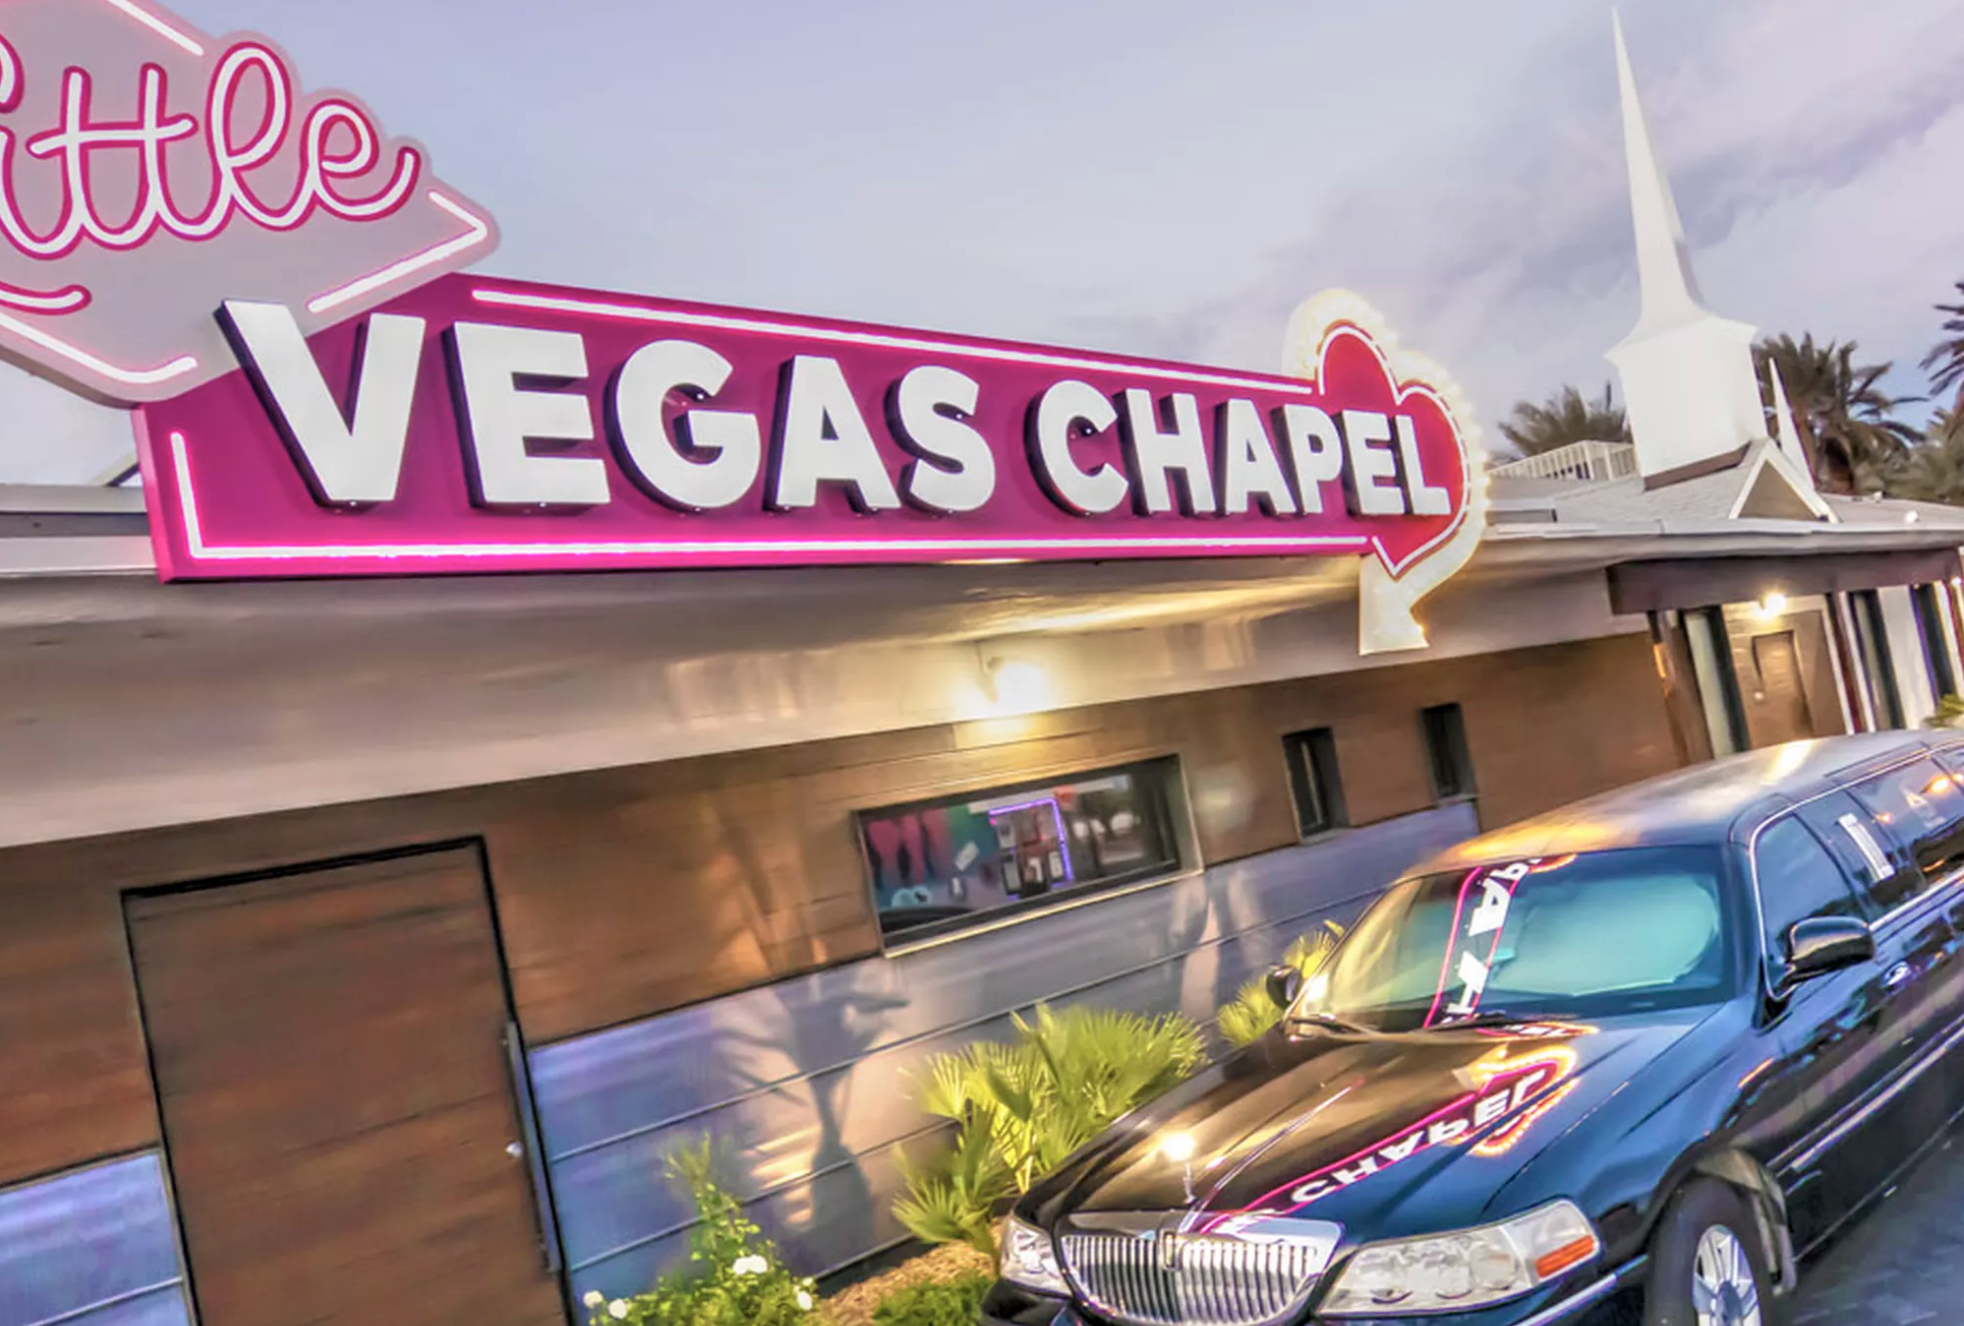 10 Weddings A Day: What It's Like To Run A Wedding Chapel In Las Vegas